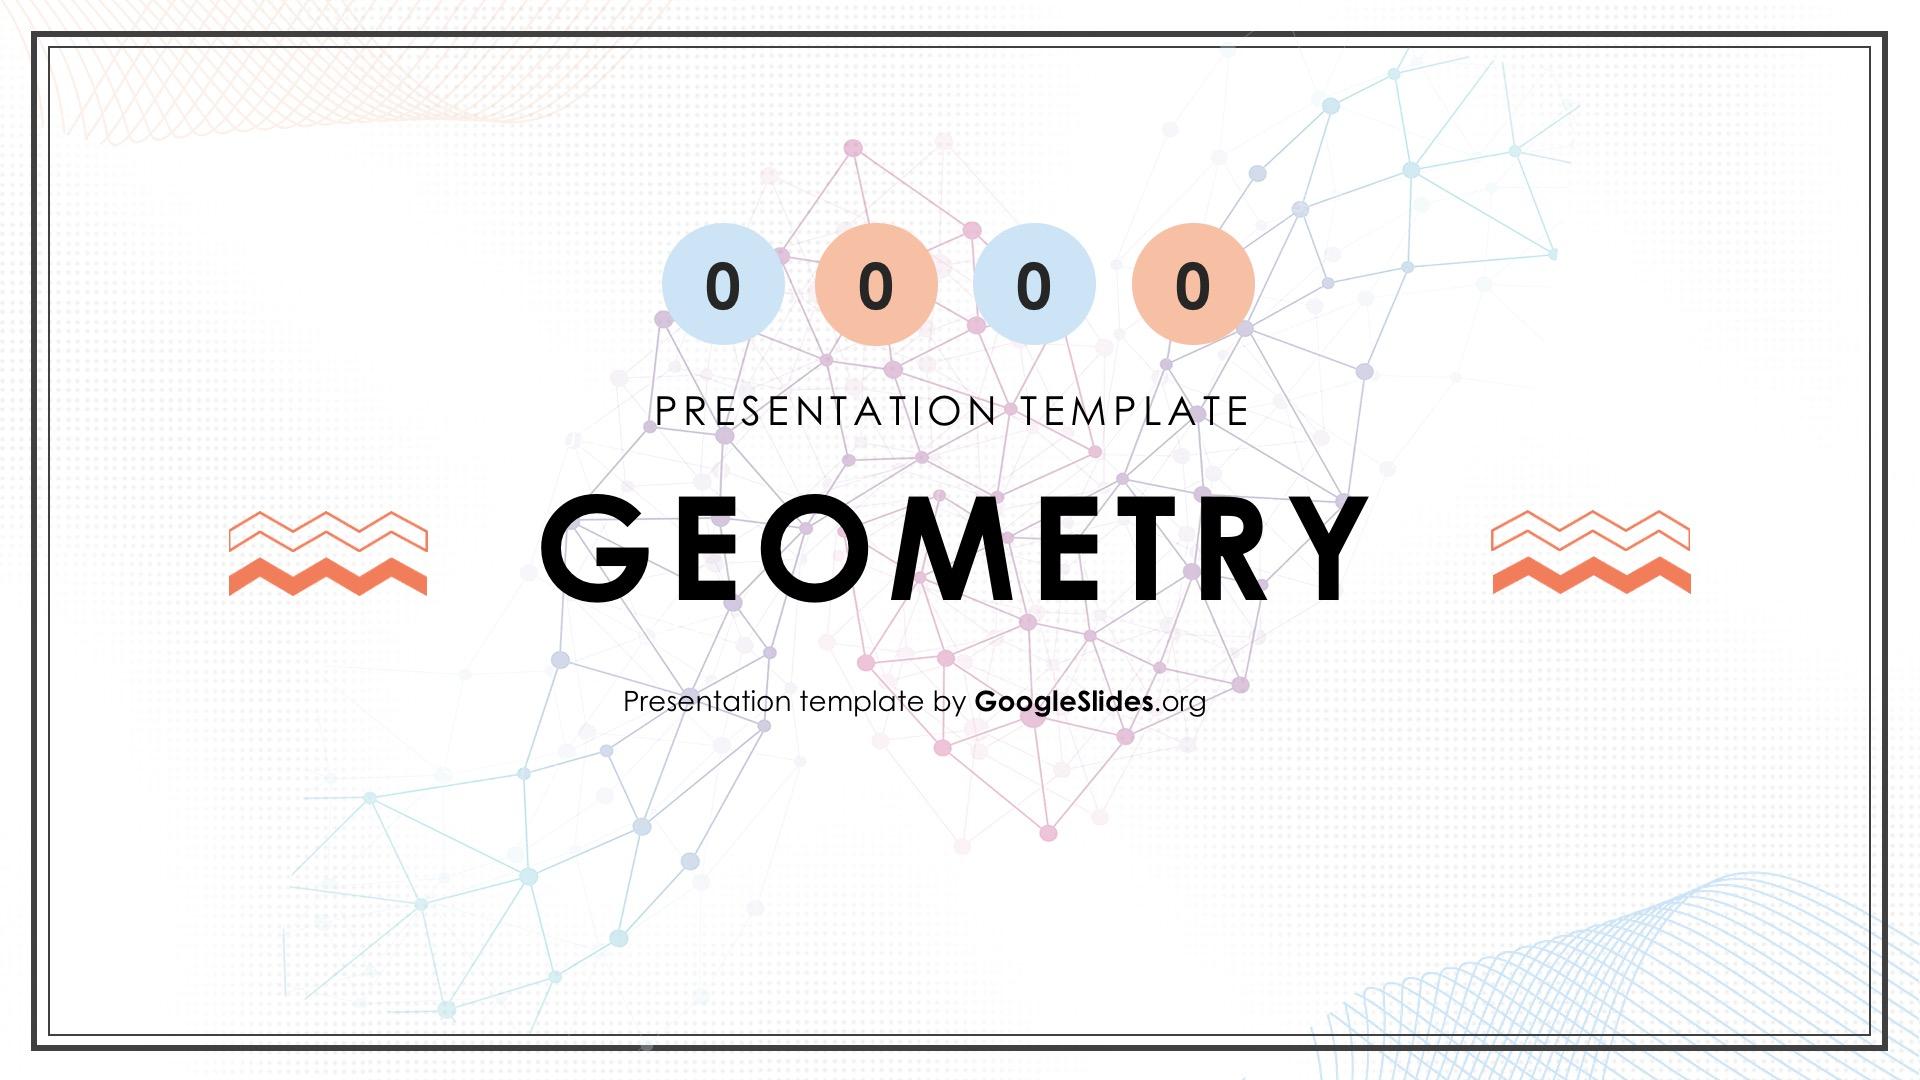 Geometry Google Slides